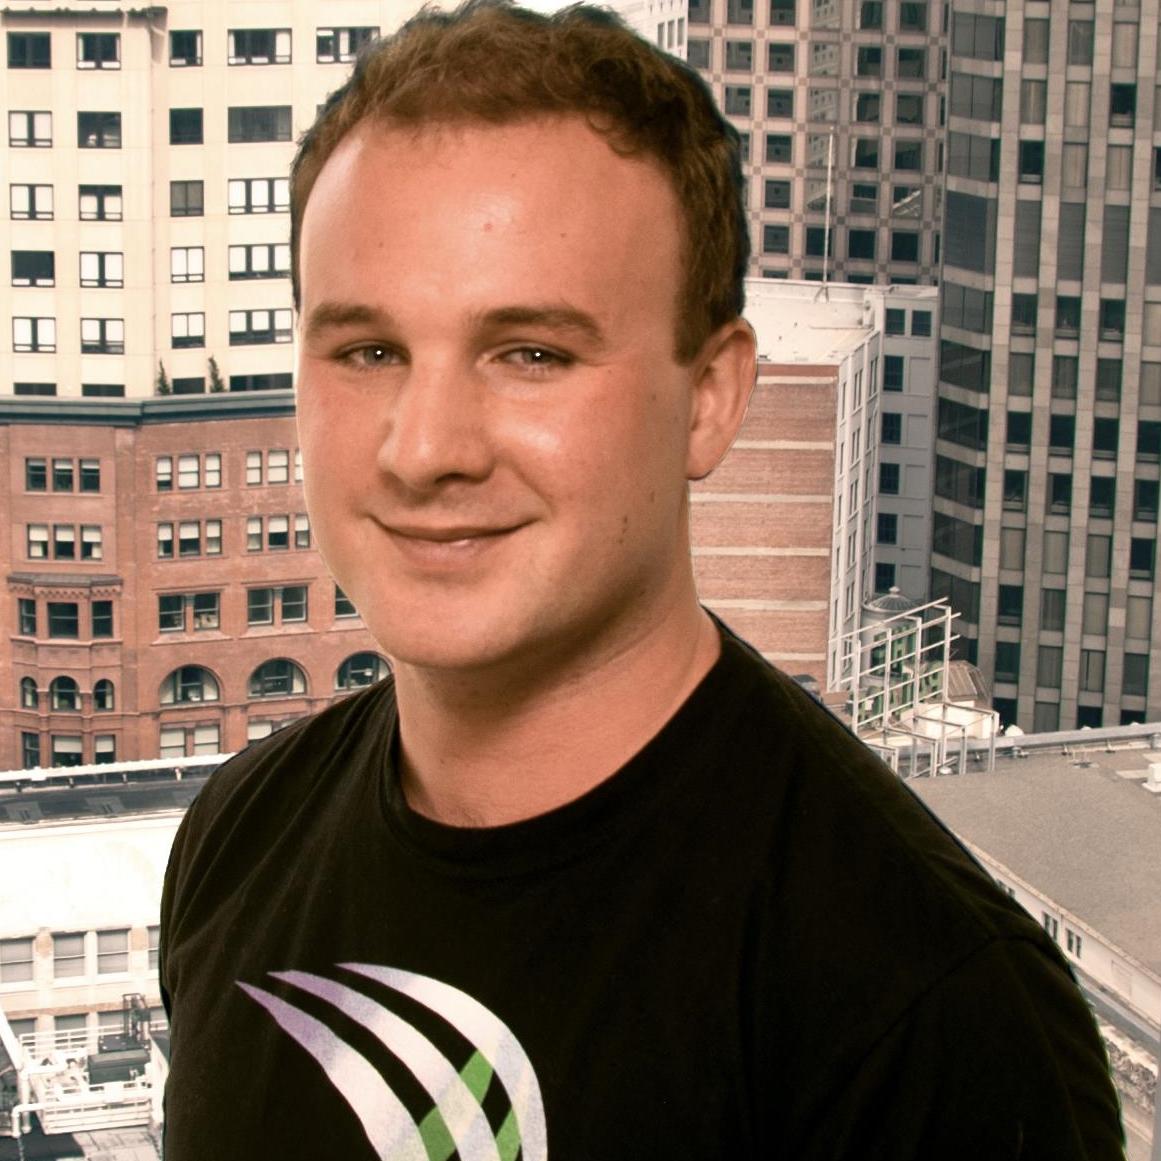 Startups: Building Success at Switfkey